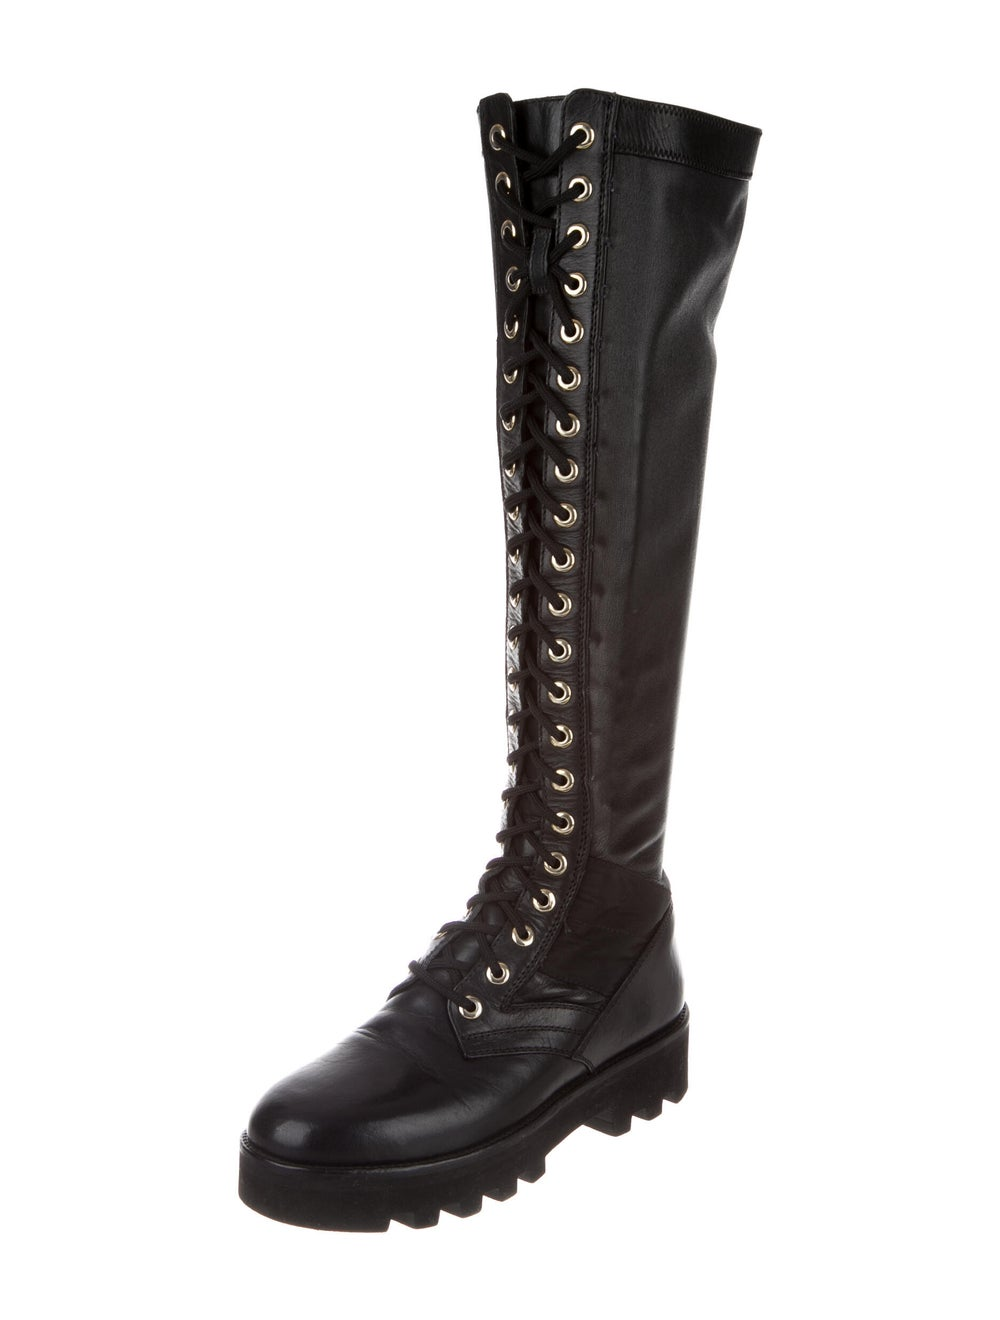 Altuzarra Leather Combat Boots Black - image 2